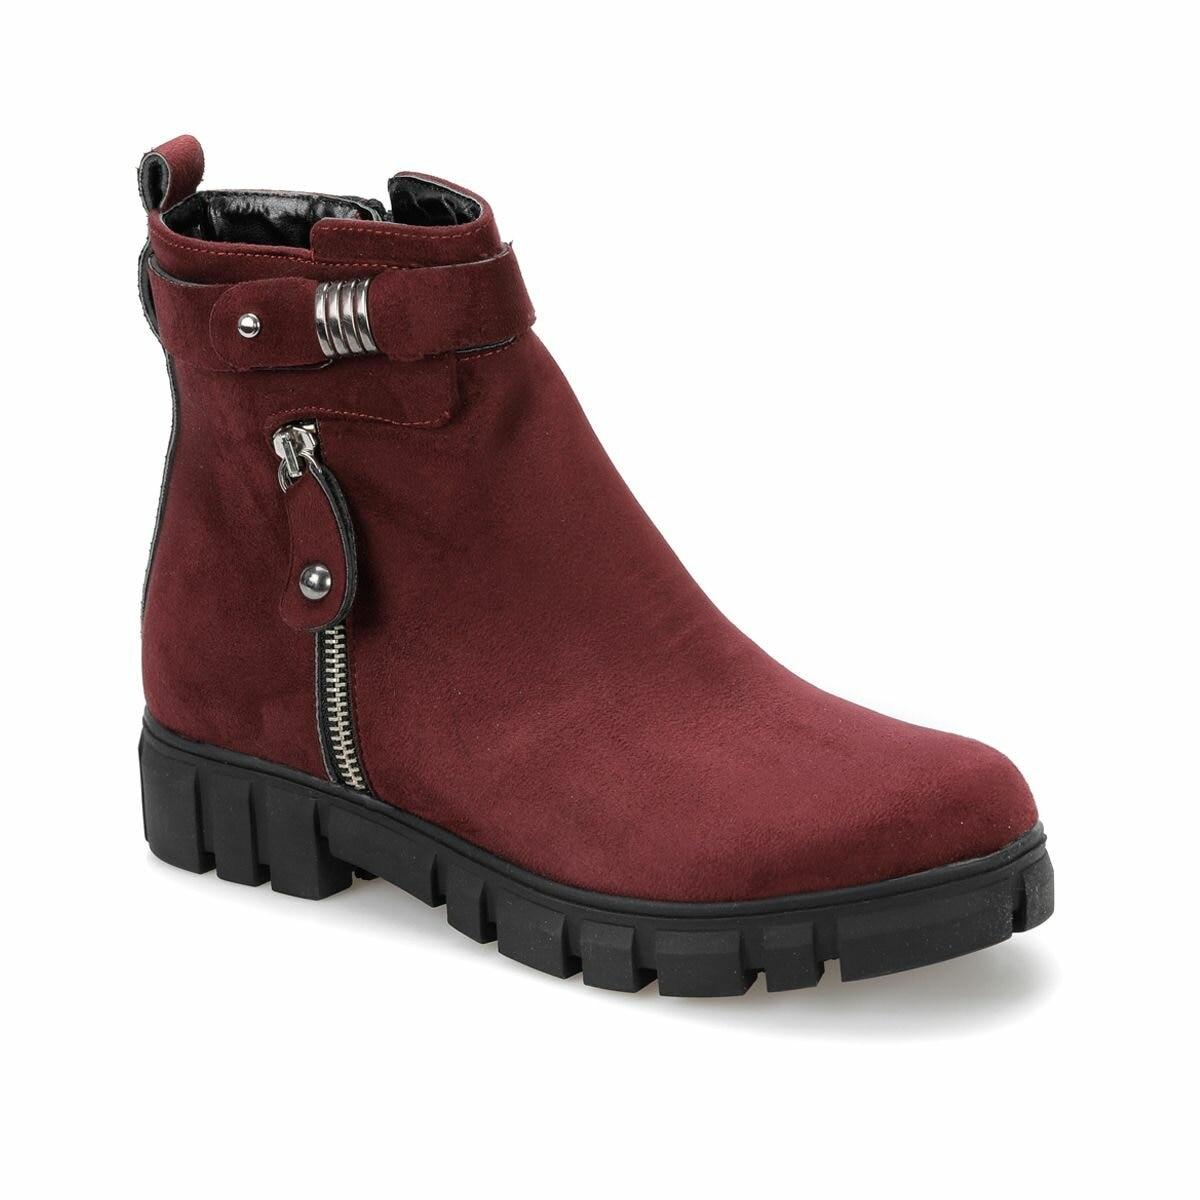 FLO AKSIN31Z Burgundy Women 'S Boots BUTIGO